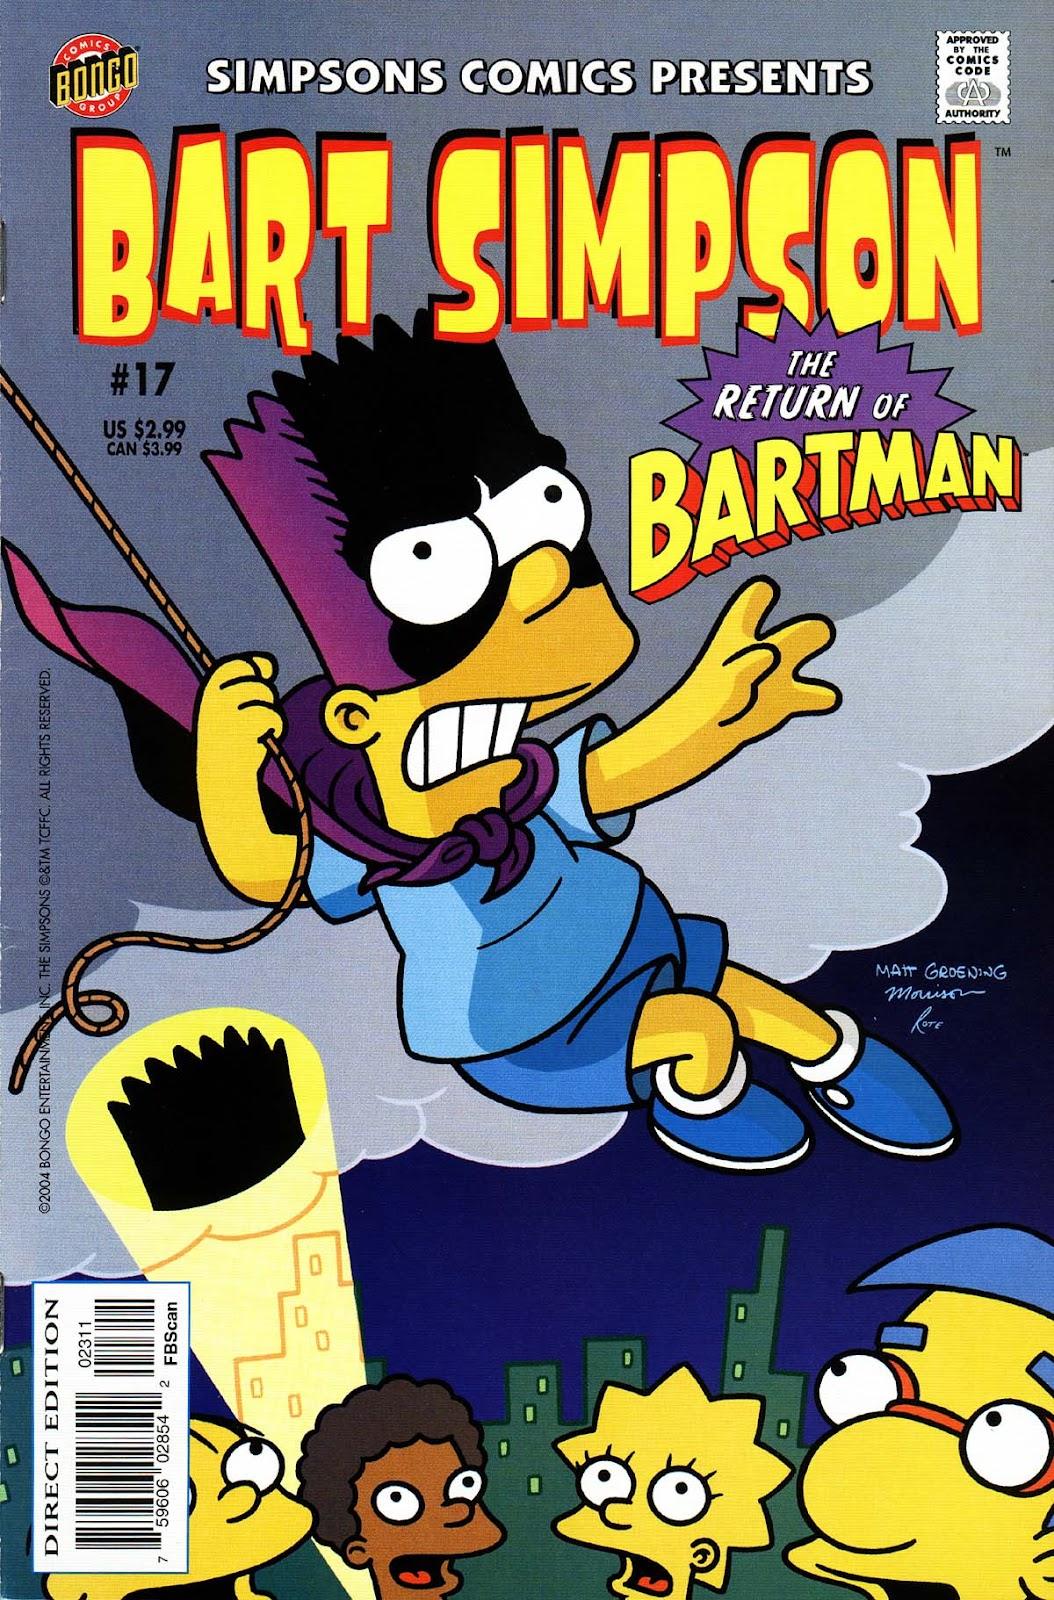 Simpsons Comics Presents Bart Simpson 17 Page 1